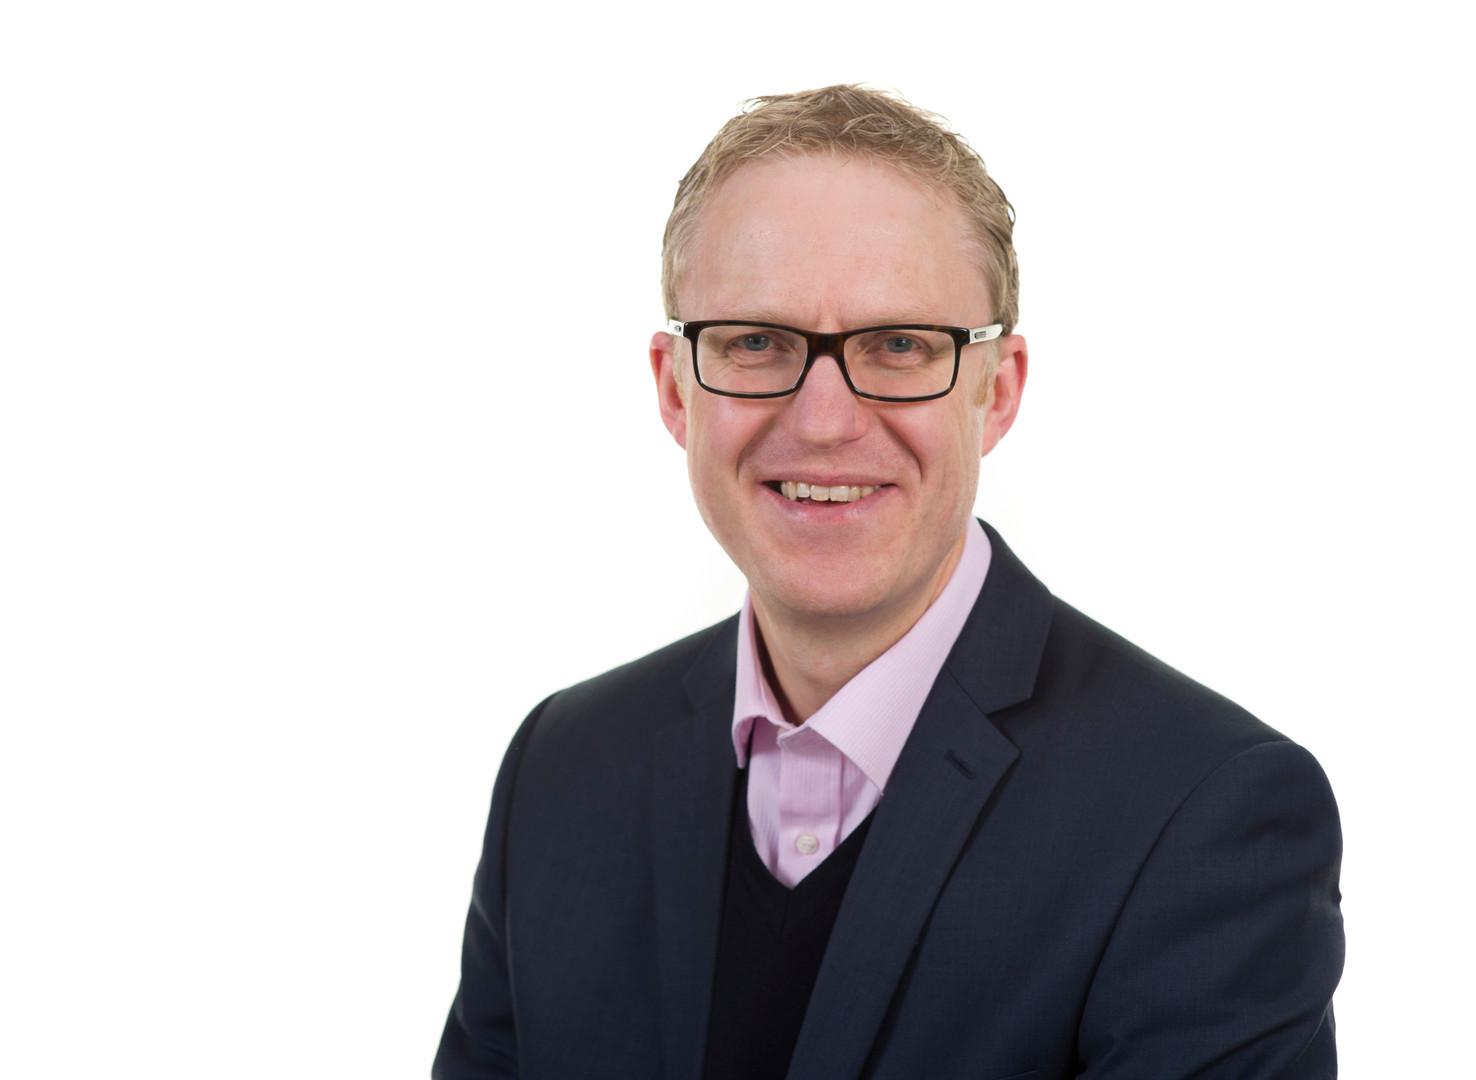 Mark Pamplin Corporate Portrait by Sirastudio. Photographers in Harrogate.